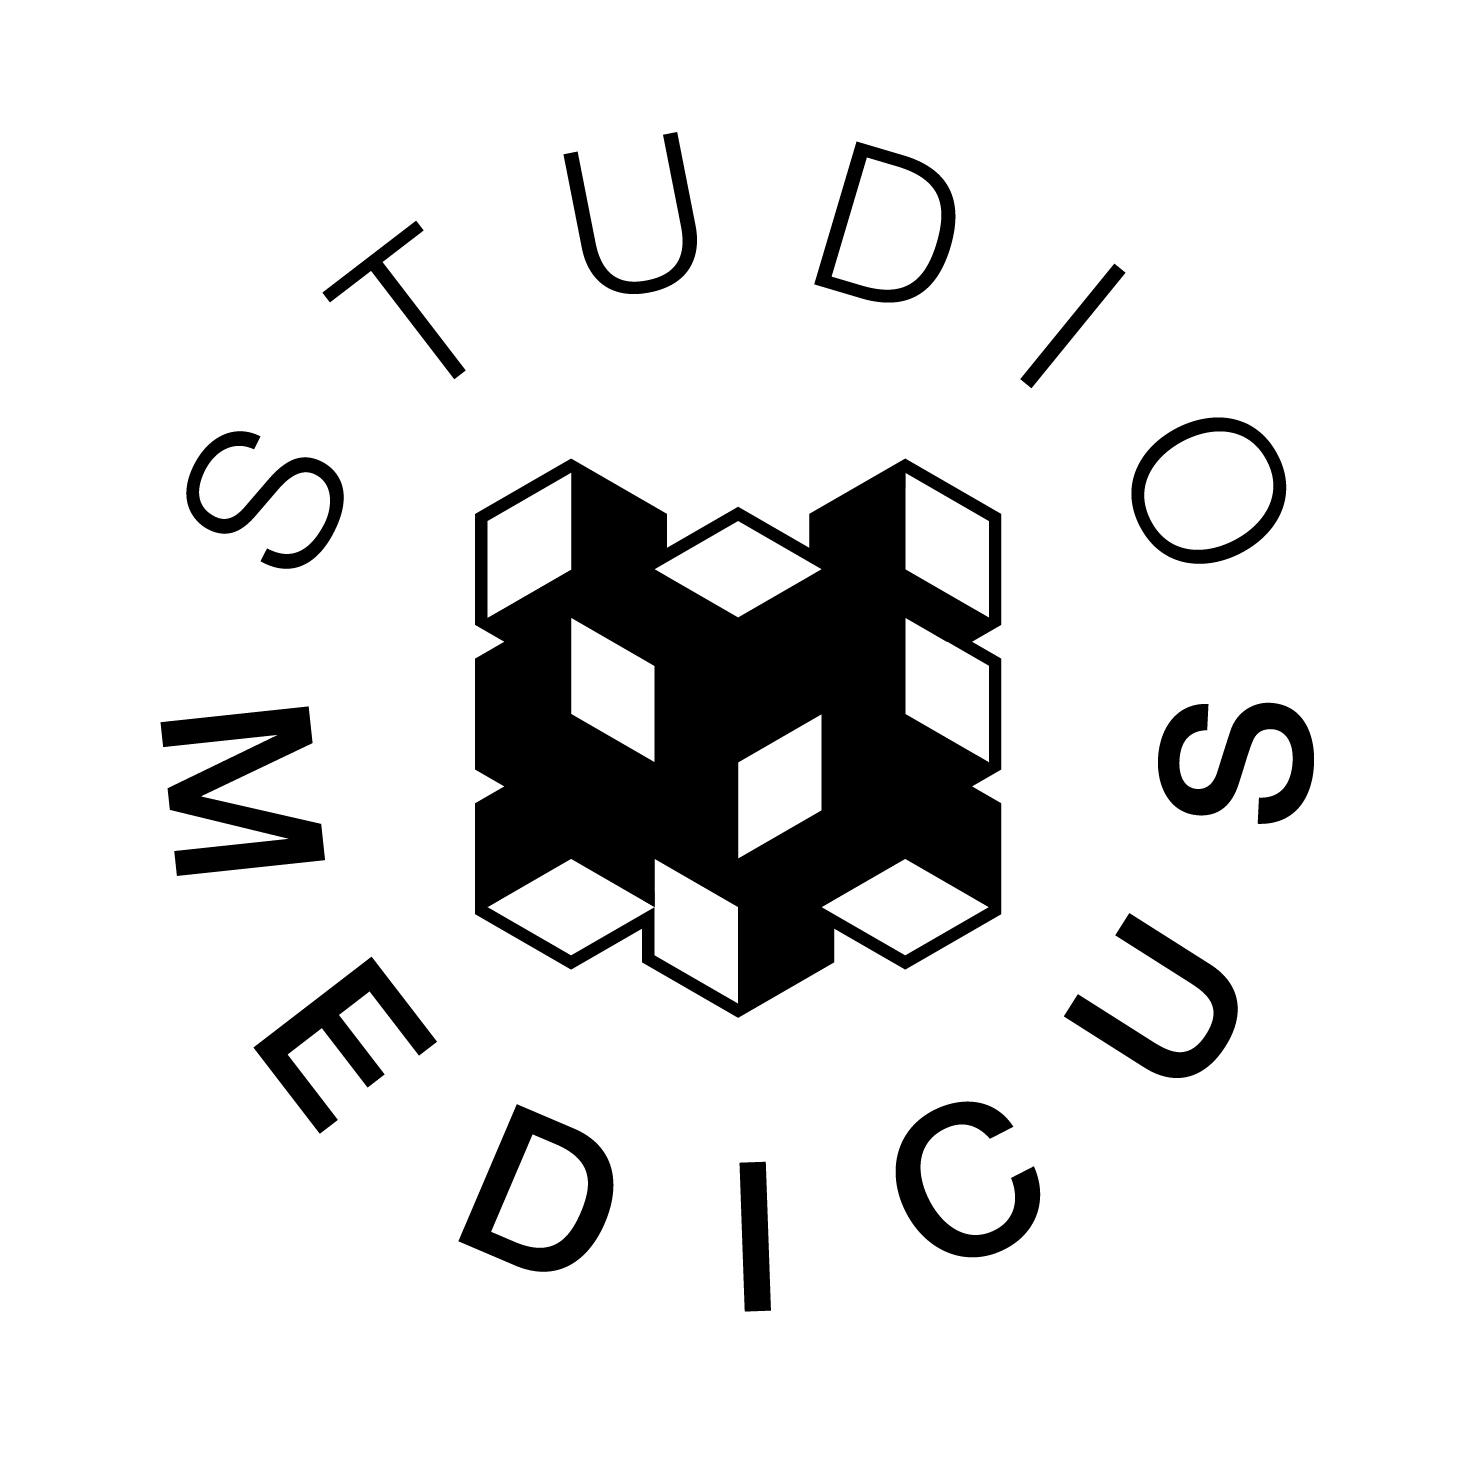 Logo 9 würfel_1 Rund copy 14